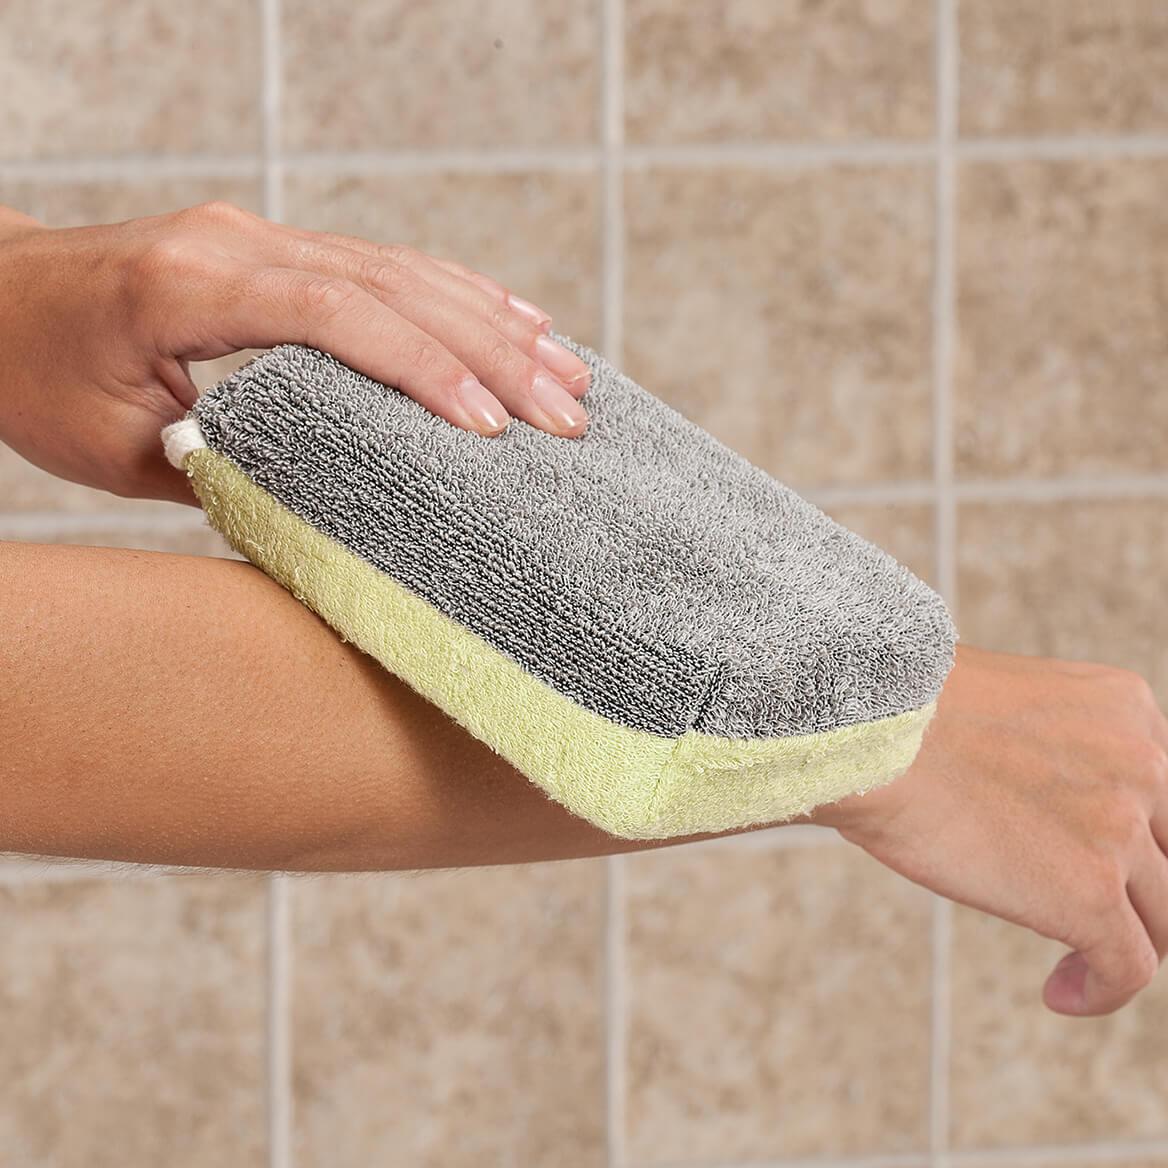 3-in-1 Extendable Bath Brush-366395